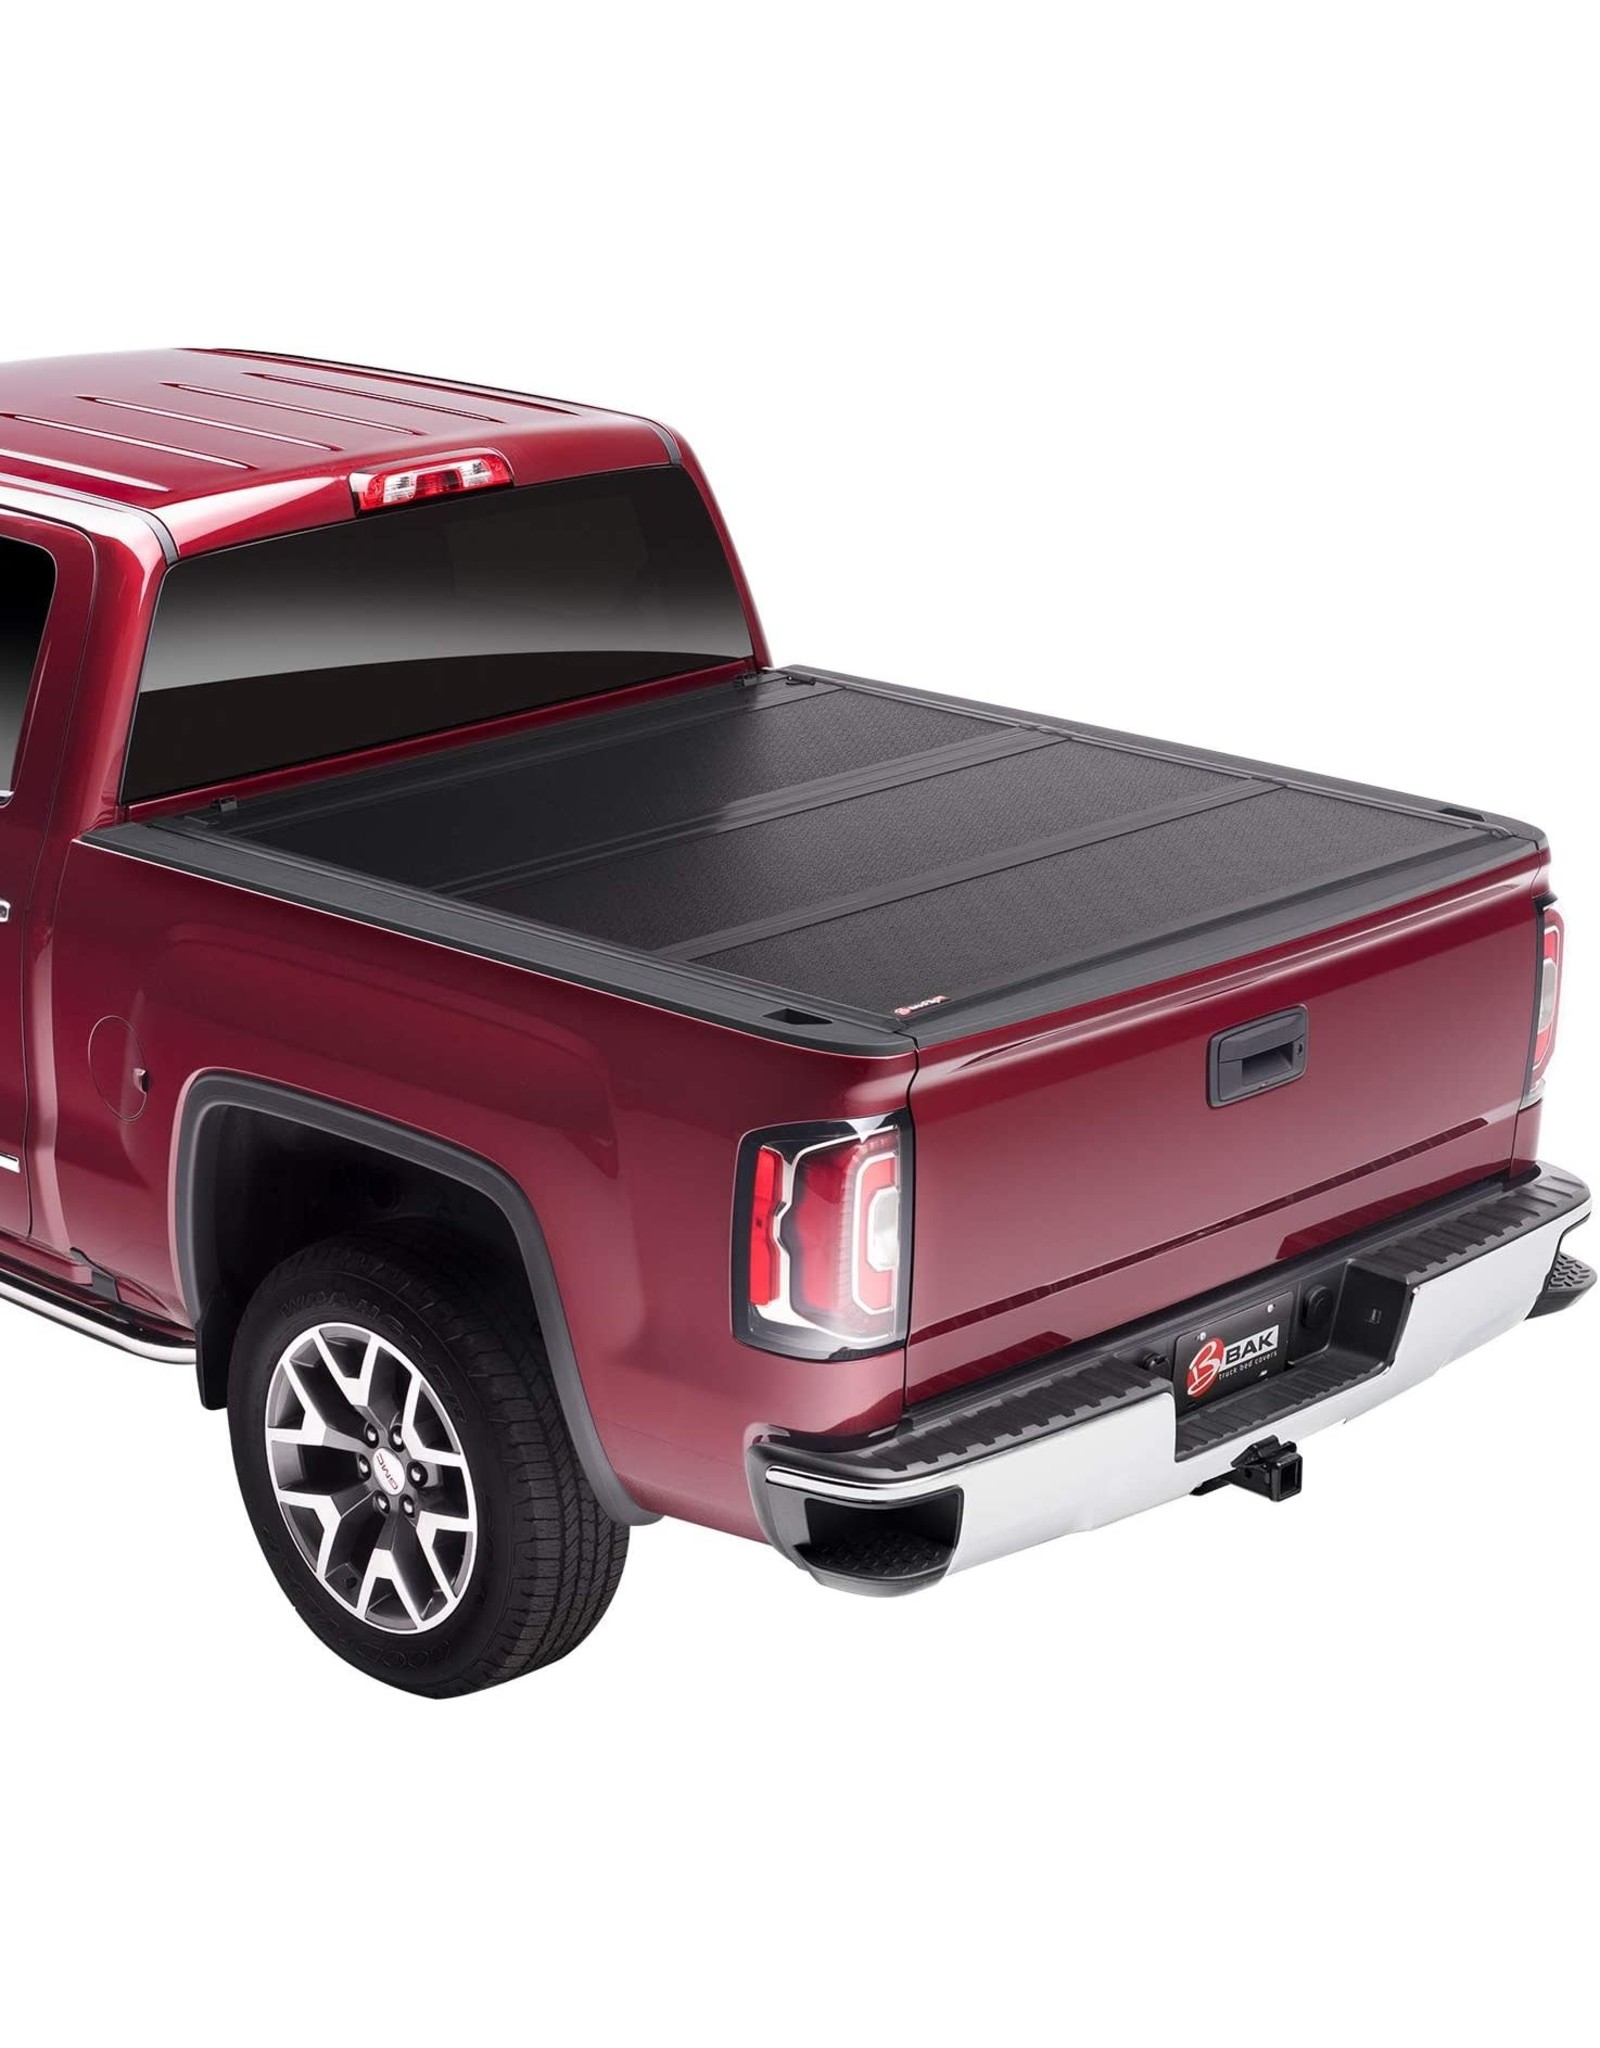 "BAK BAK BAKFlip FiberMax Hard Folding Truck Bed Tonneau Cover  1126130  Fits 2019 - 2021 GM Silverado, Sierra 1500, Will not fit Carbon Pro Bed 5' 10"" Bed (69.9"")"